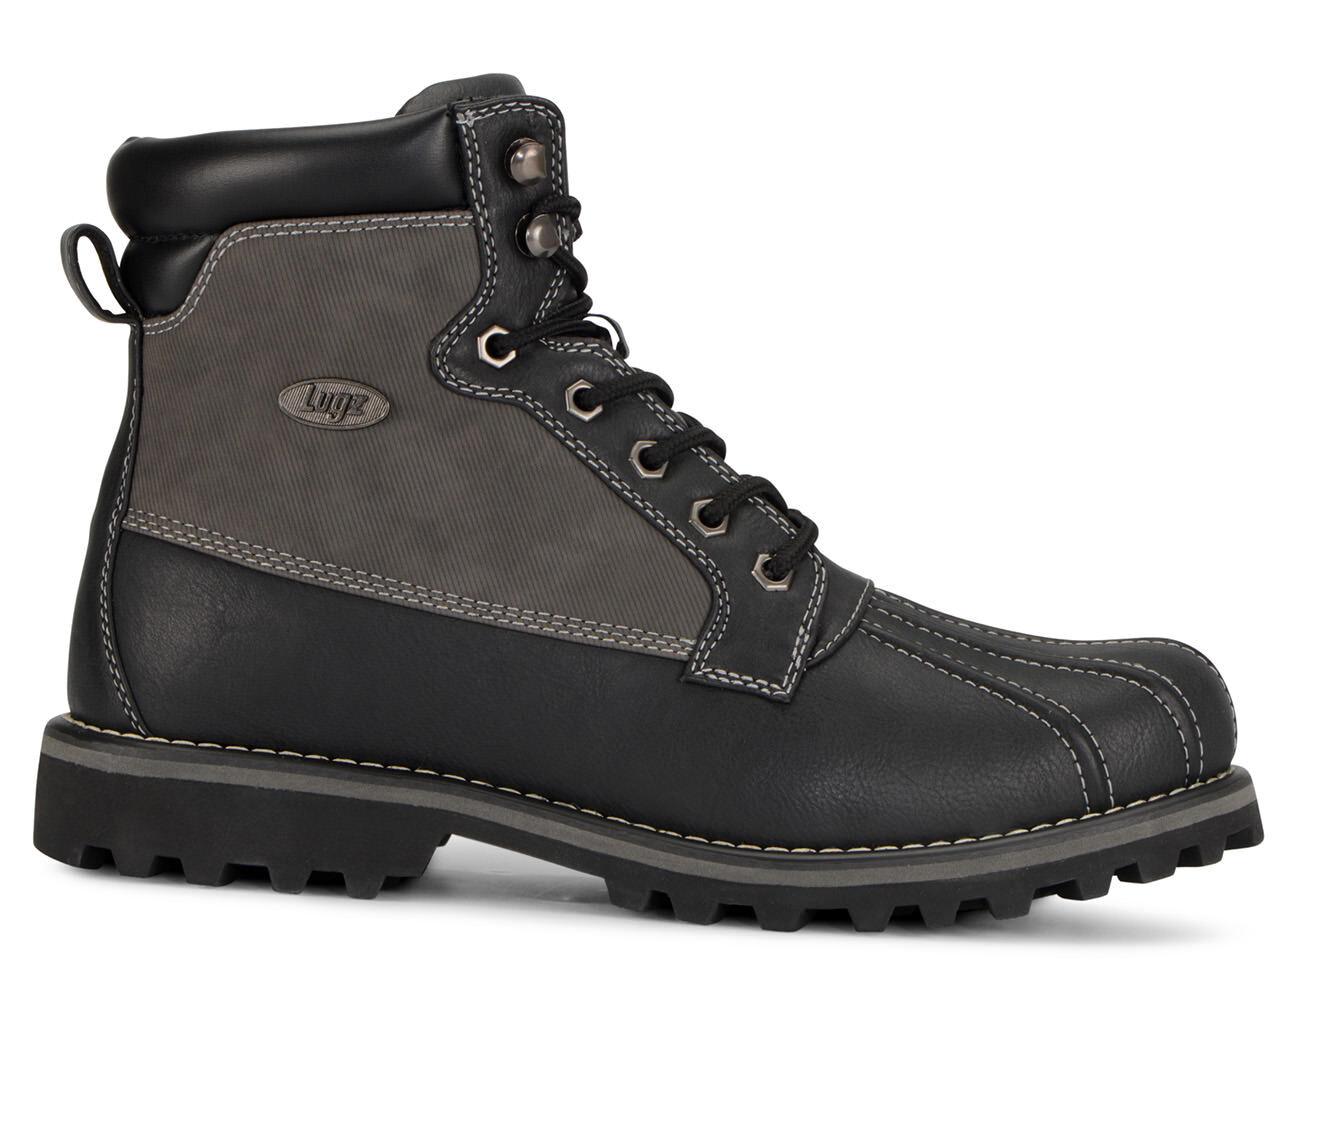 Men's Lugz Mallard Duck Boots Black/Charcoal